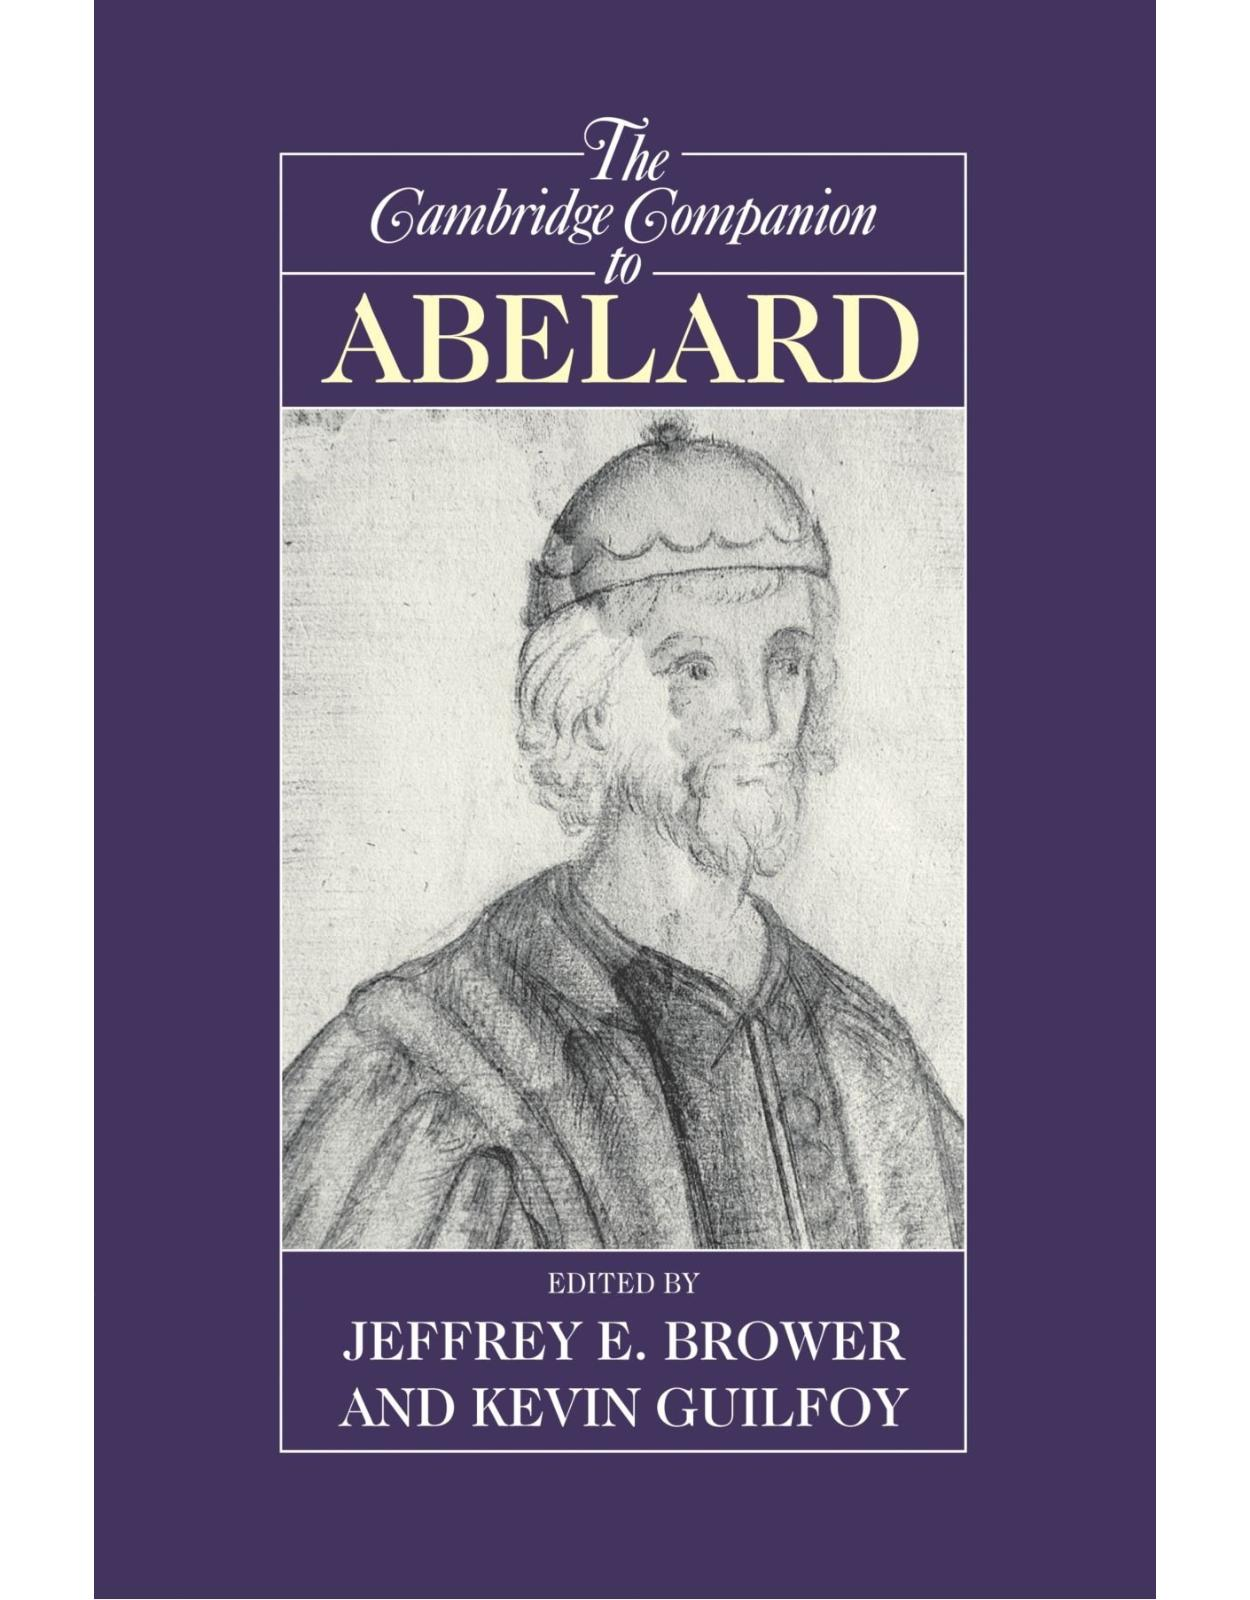 The Cambridge Companion to Abelard (Cambridge Companions to Philosophy)